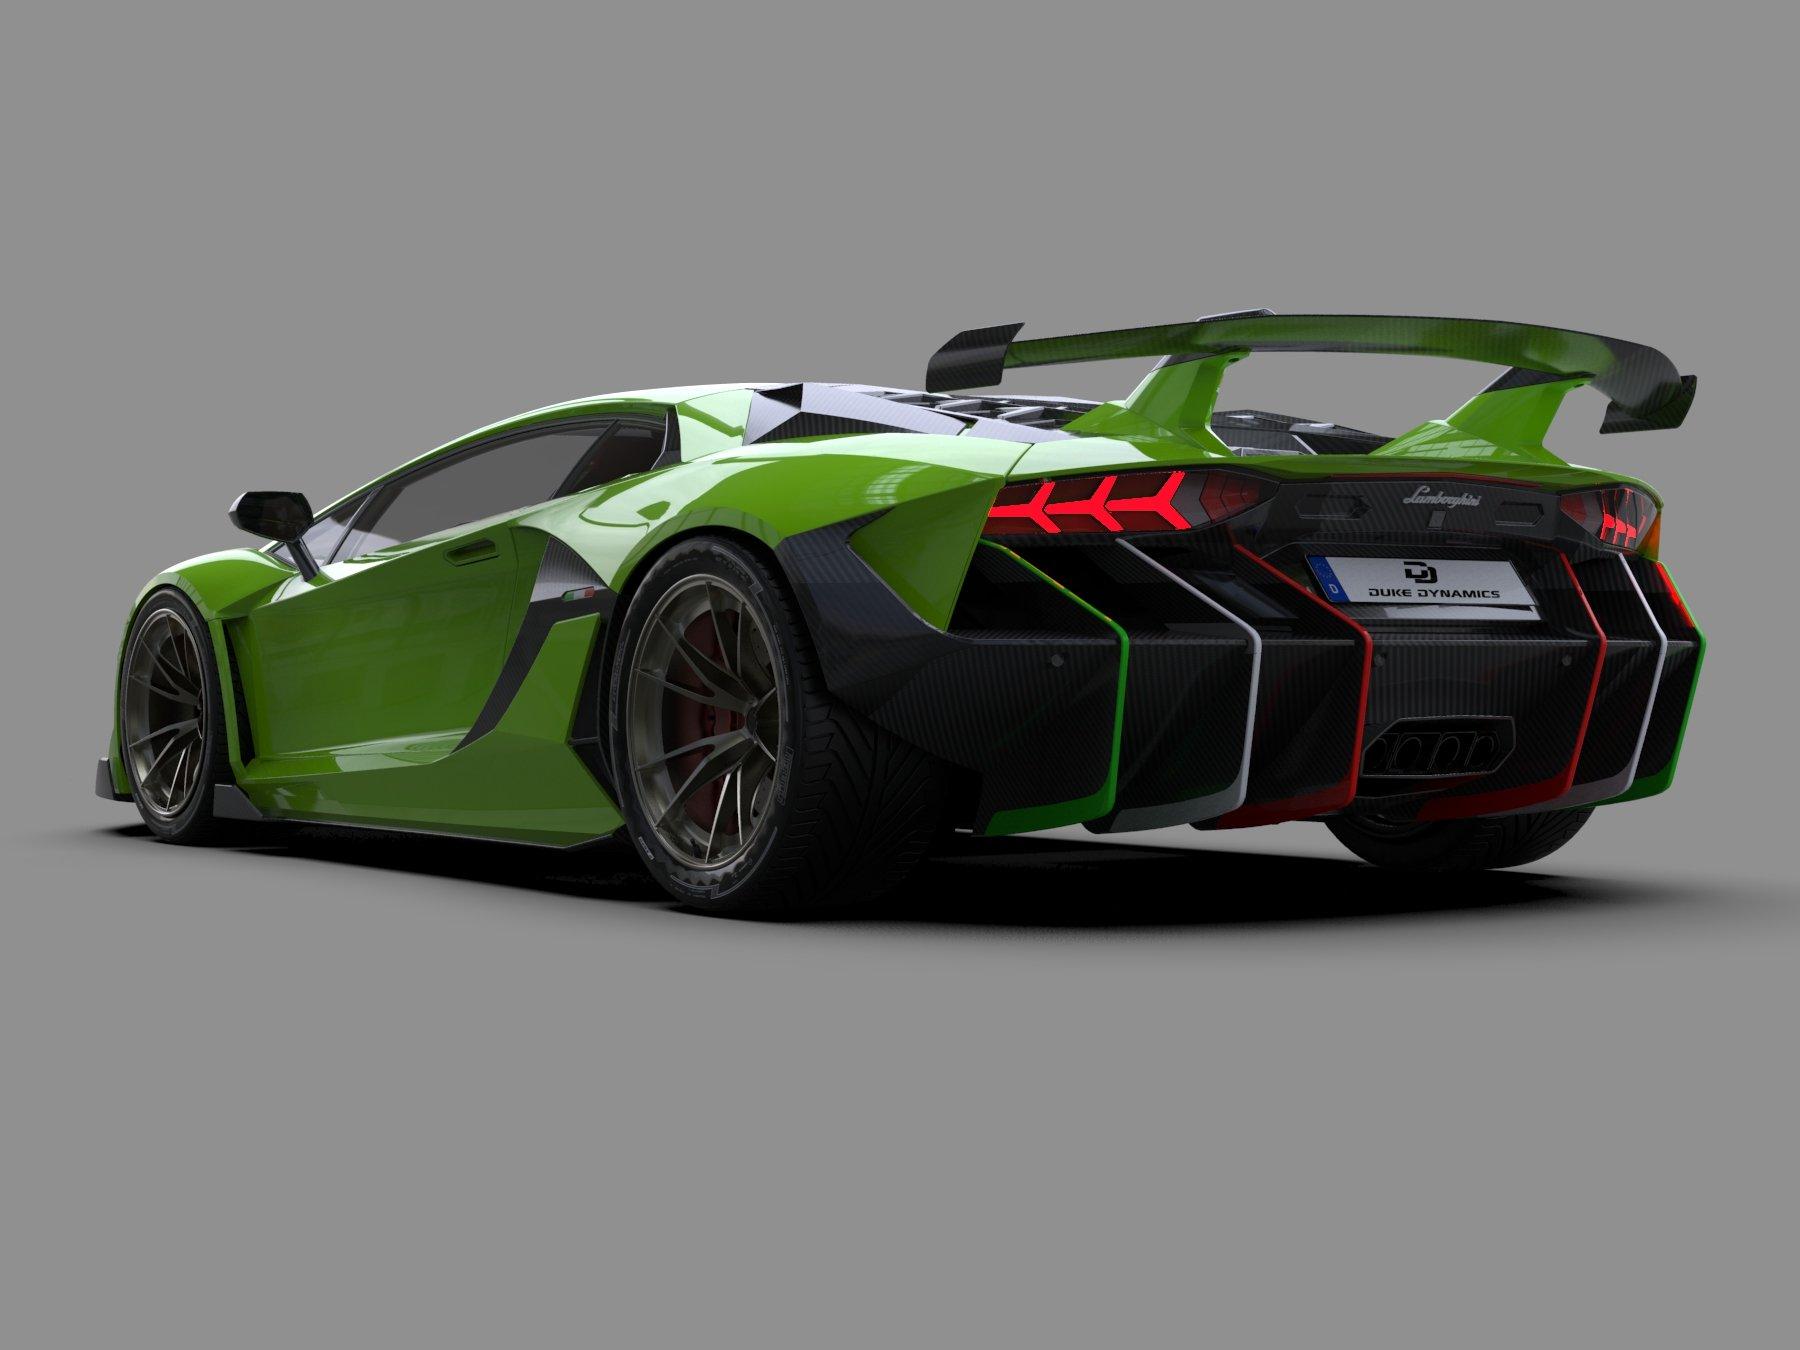 Lamborghini_Aventador_by_Duke_Dynamics_0026